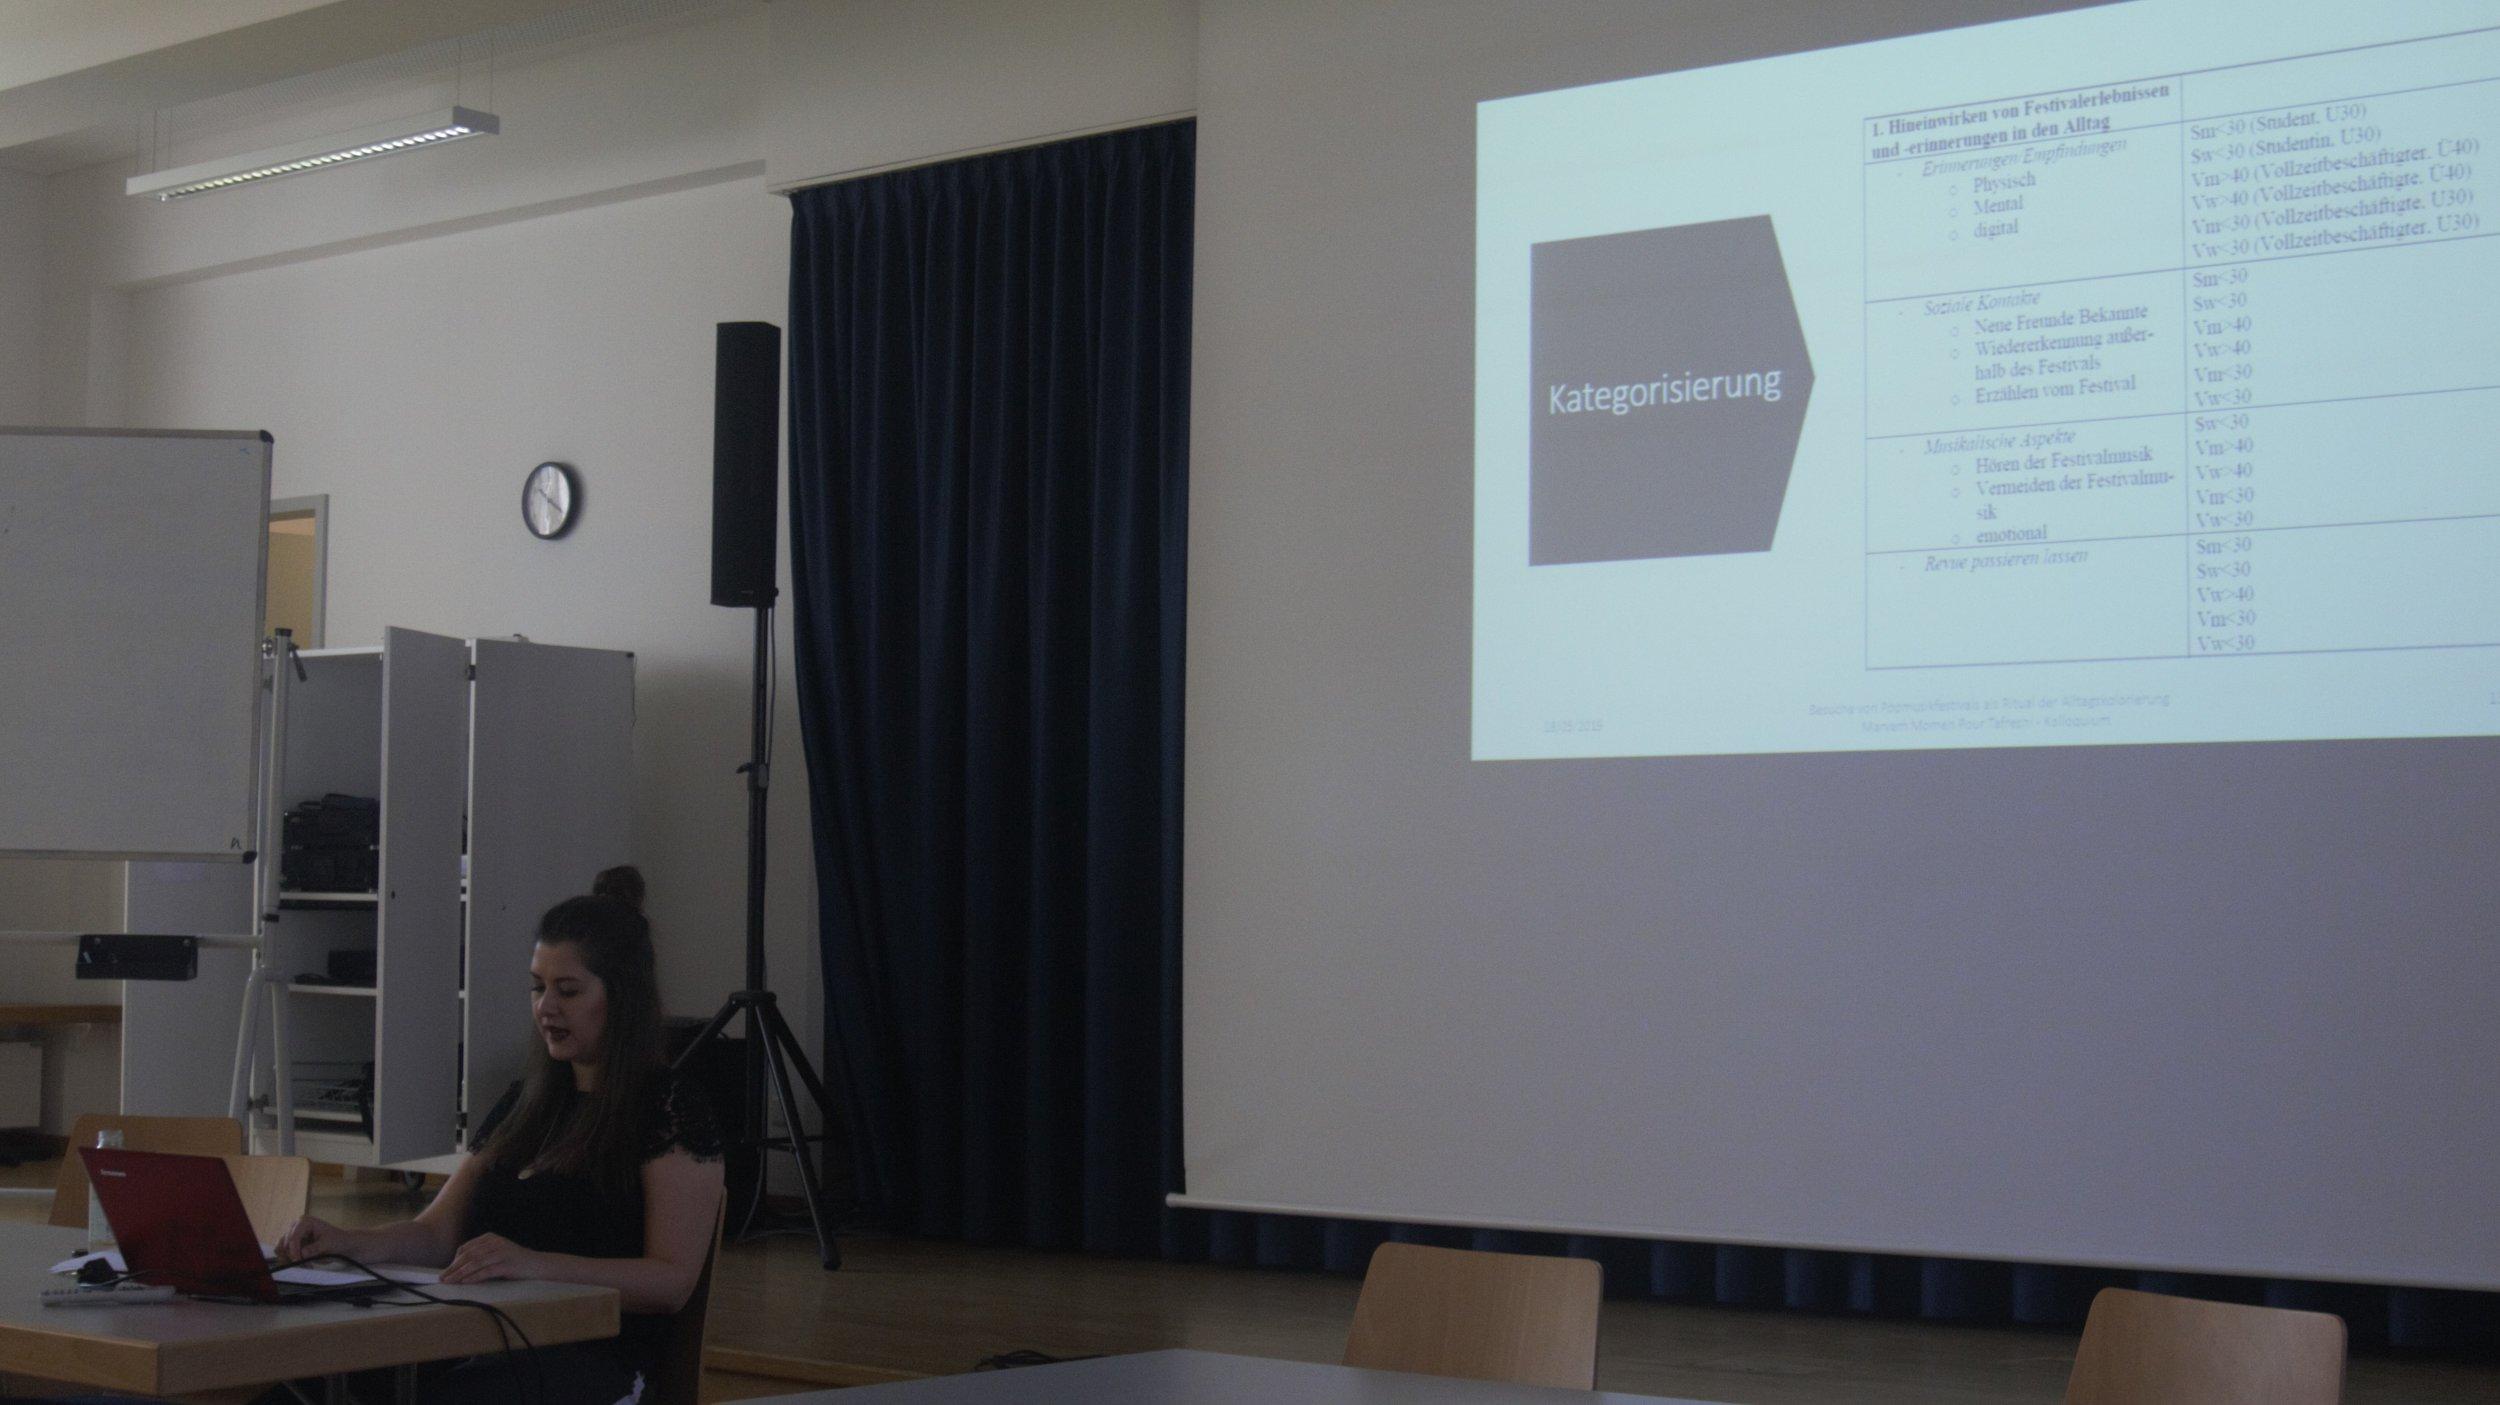 CMP Braunschweig 18.05.2019 - Maryam Momen Pour Tafreshi (Universität Paderborn)